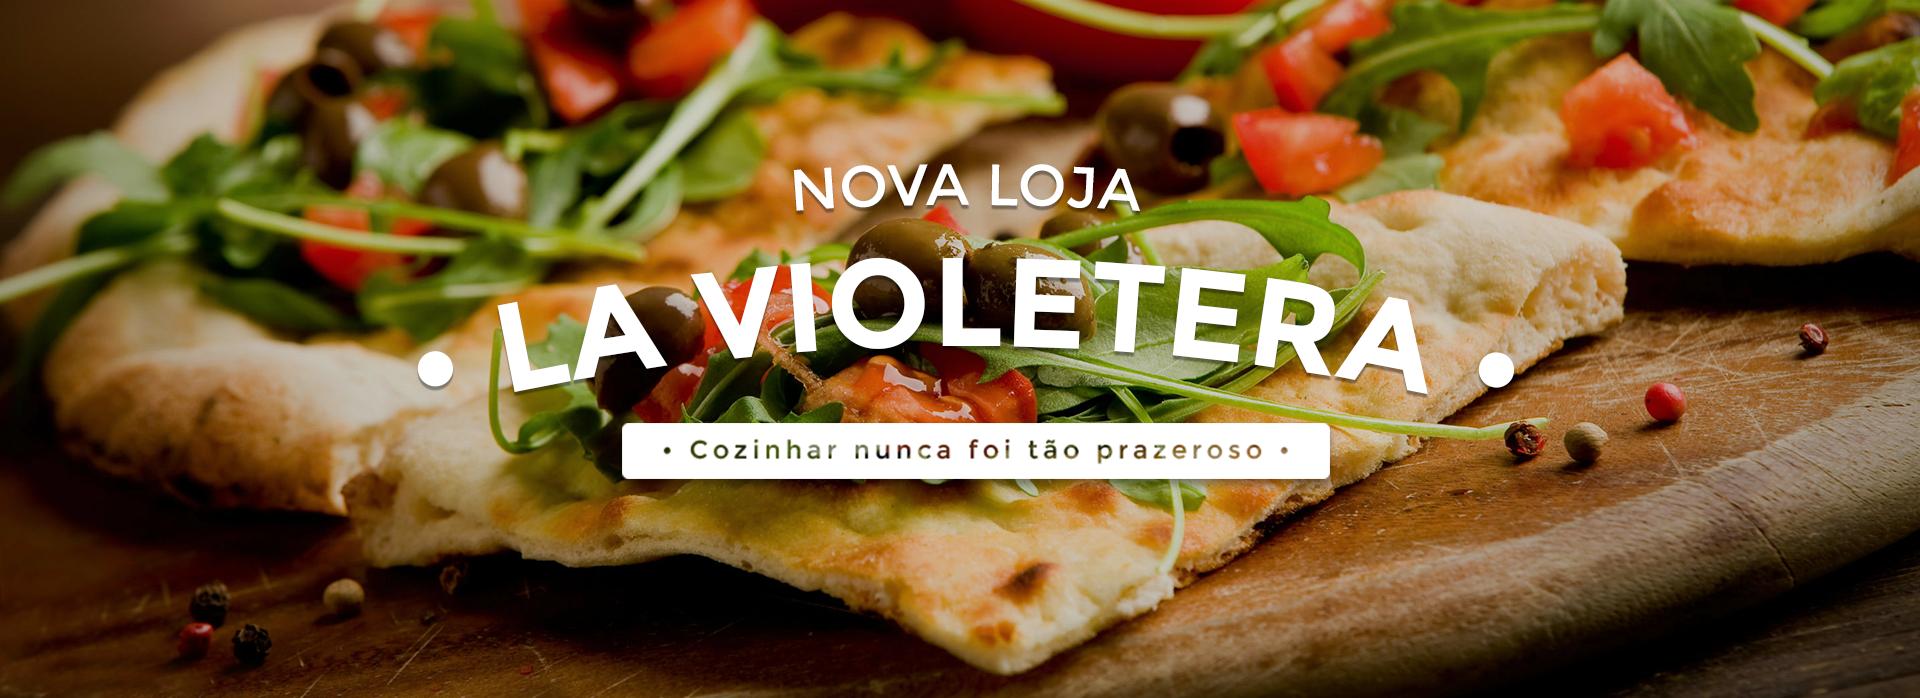 Nova Loja La Violetera